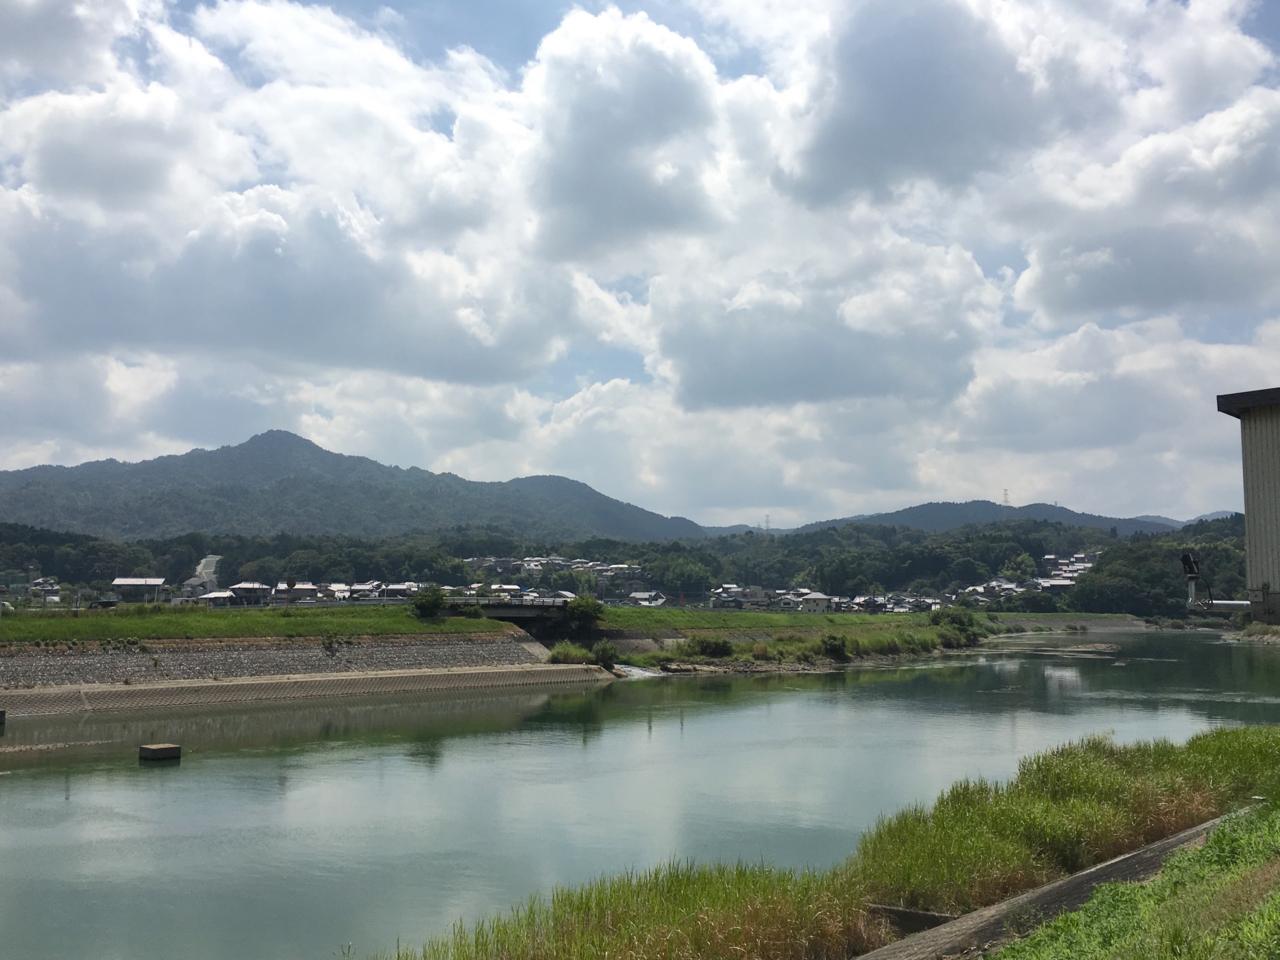 f:id:takatakamanbou:20160821114240j:plain